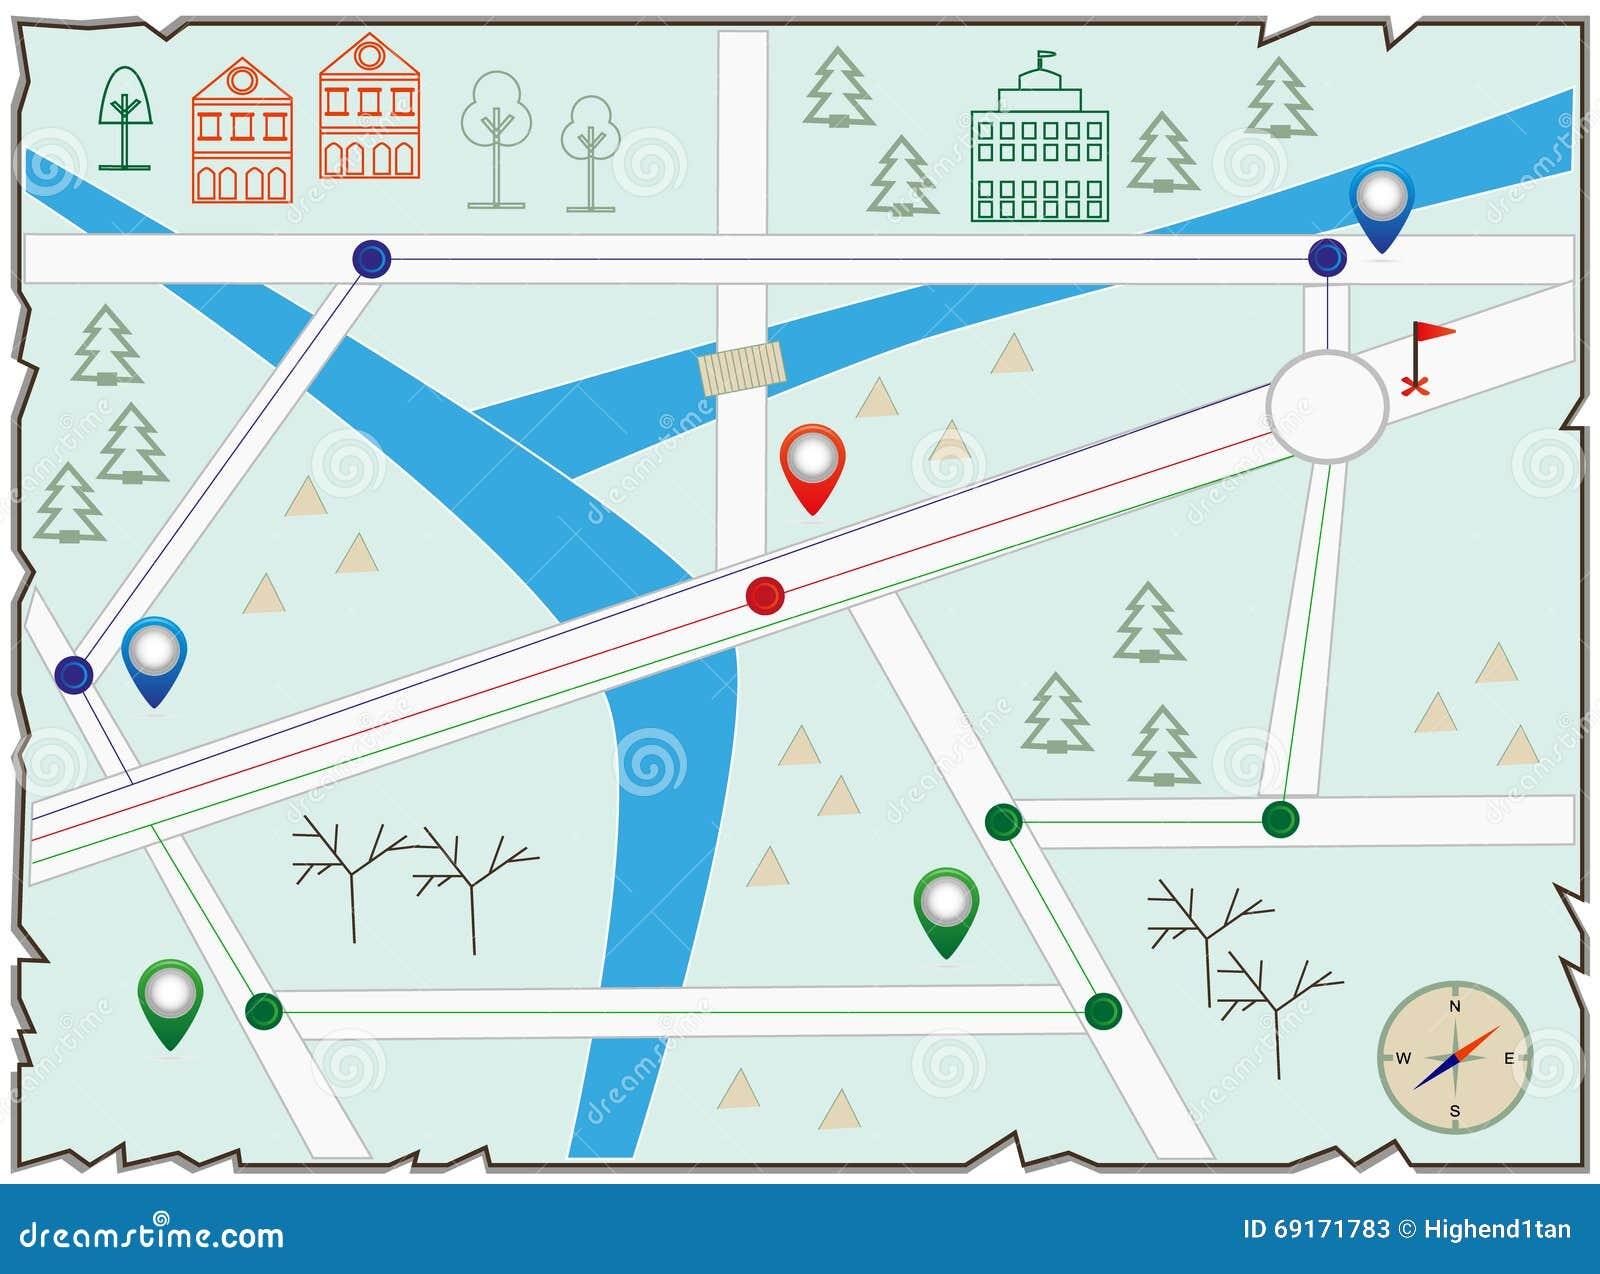 Map of treasure island stock illustration  Illustration of